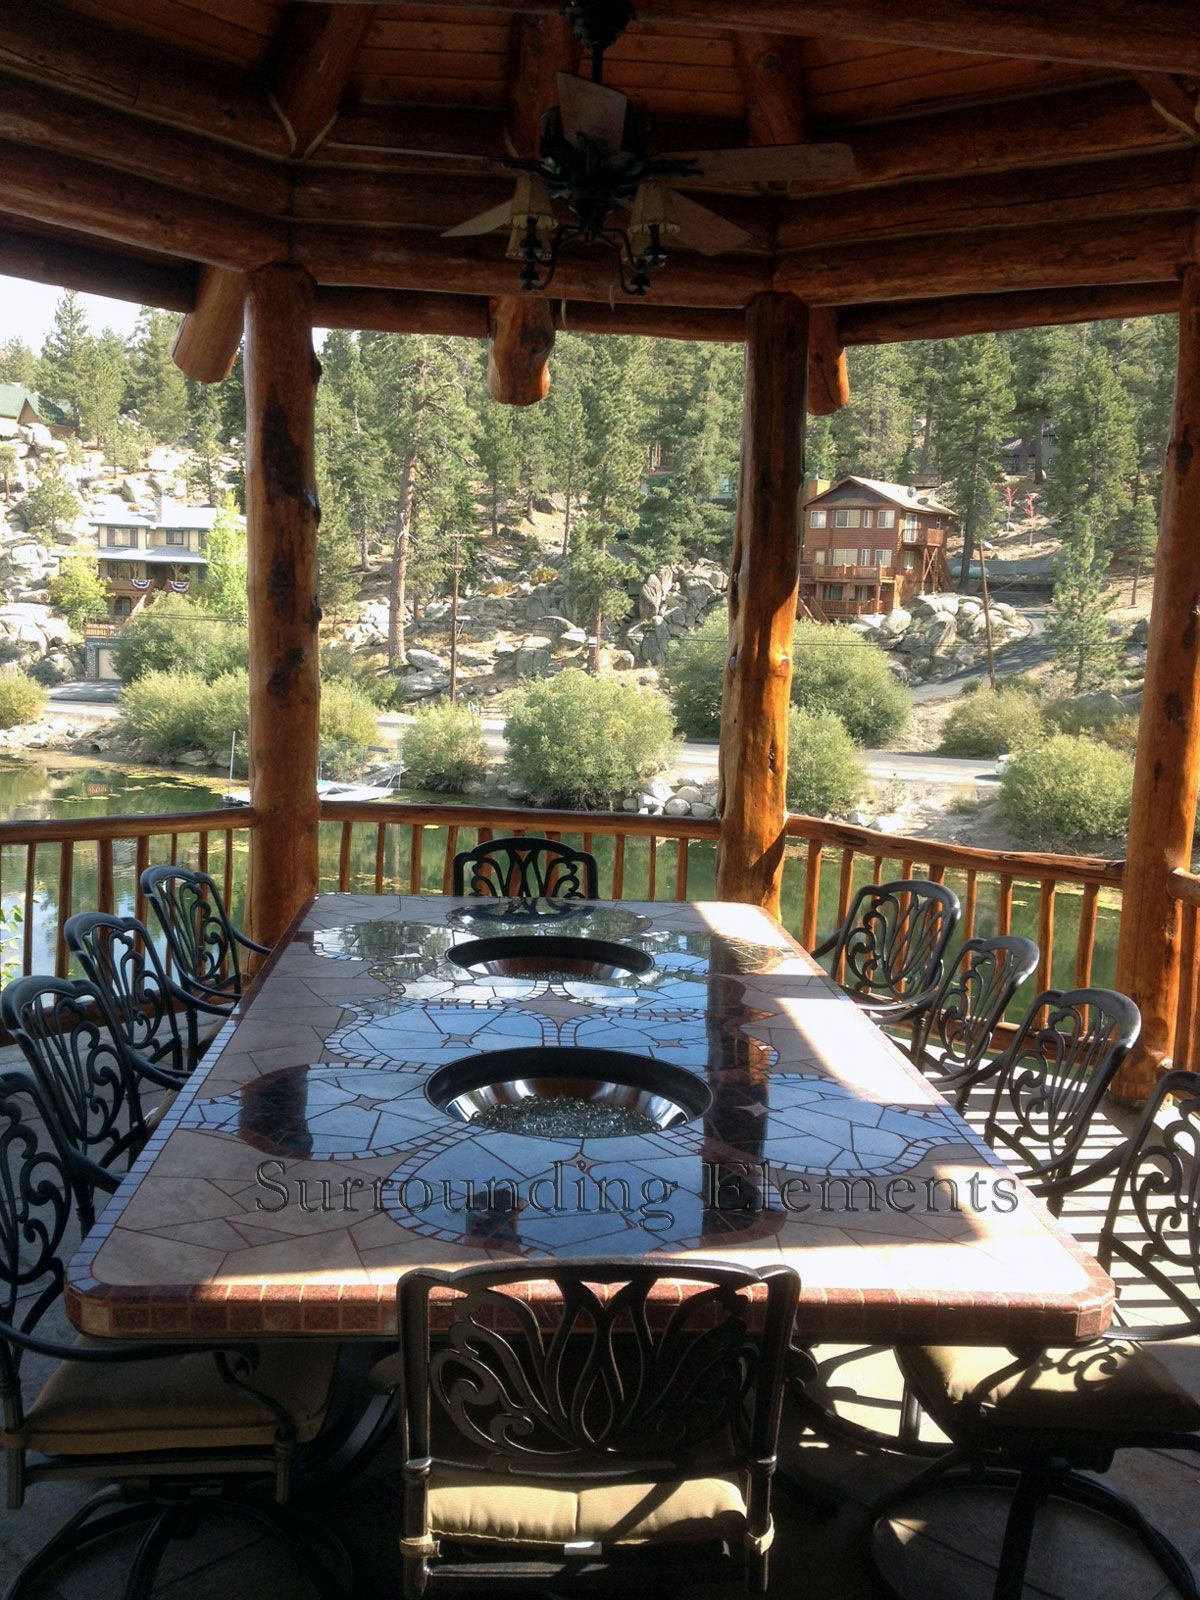 9u0027 Rectangle Mosaic Table On Iron Base With 2 Glass Burners Vineyard Design  Item#